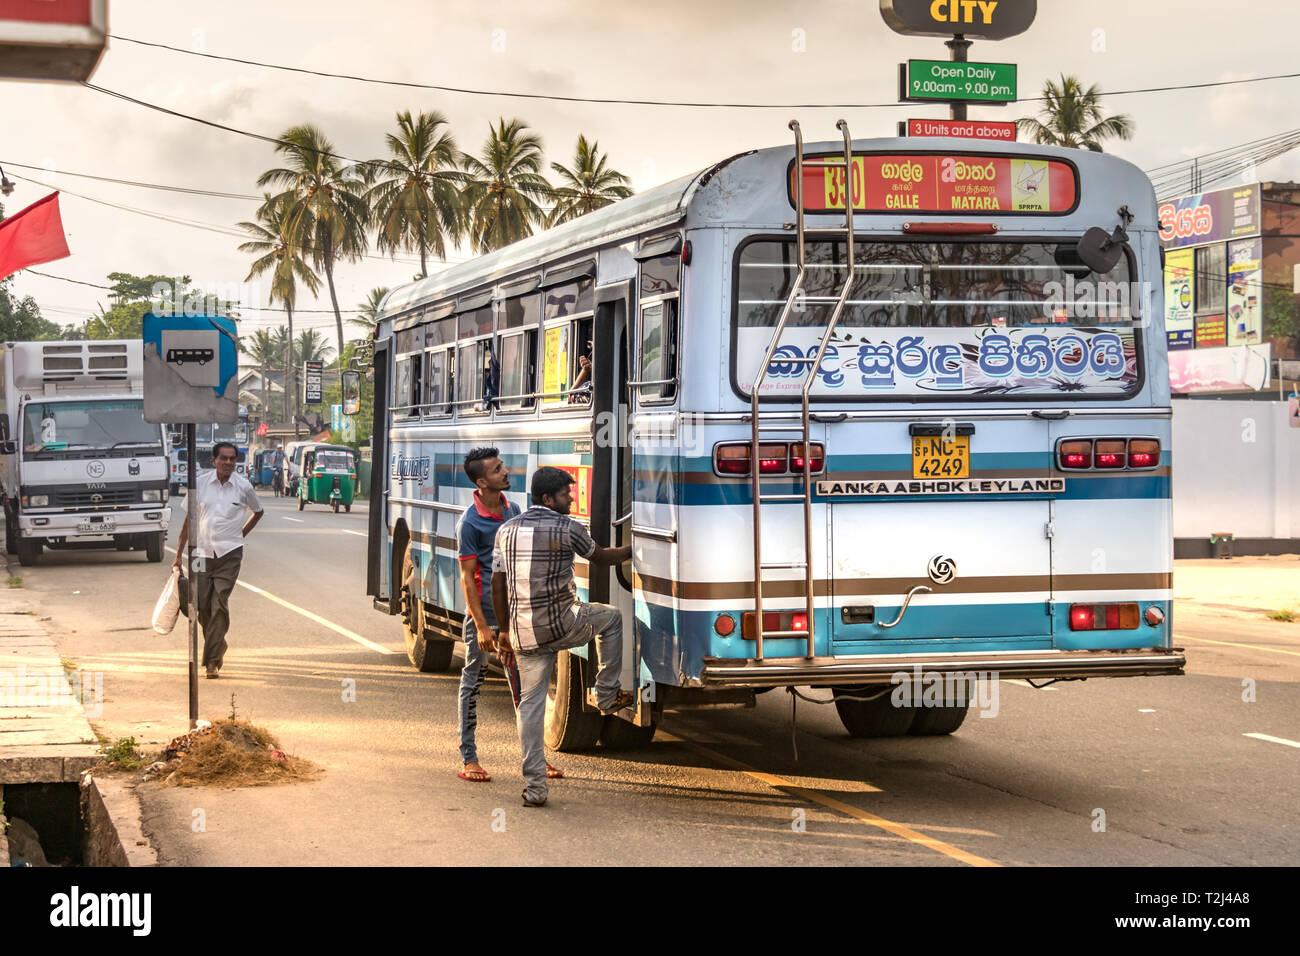 Sri Lanka Bus Stock Photos & Sri Lanka Bus Stock Images - Alamy